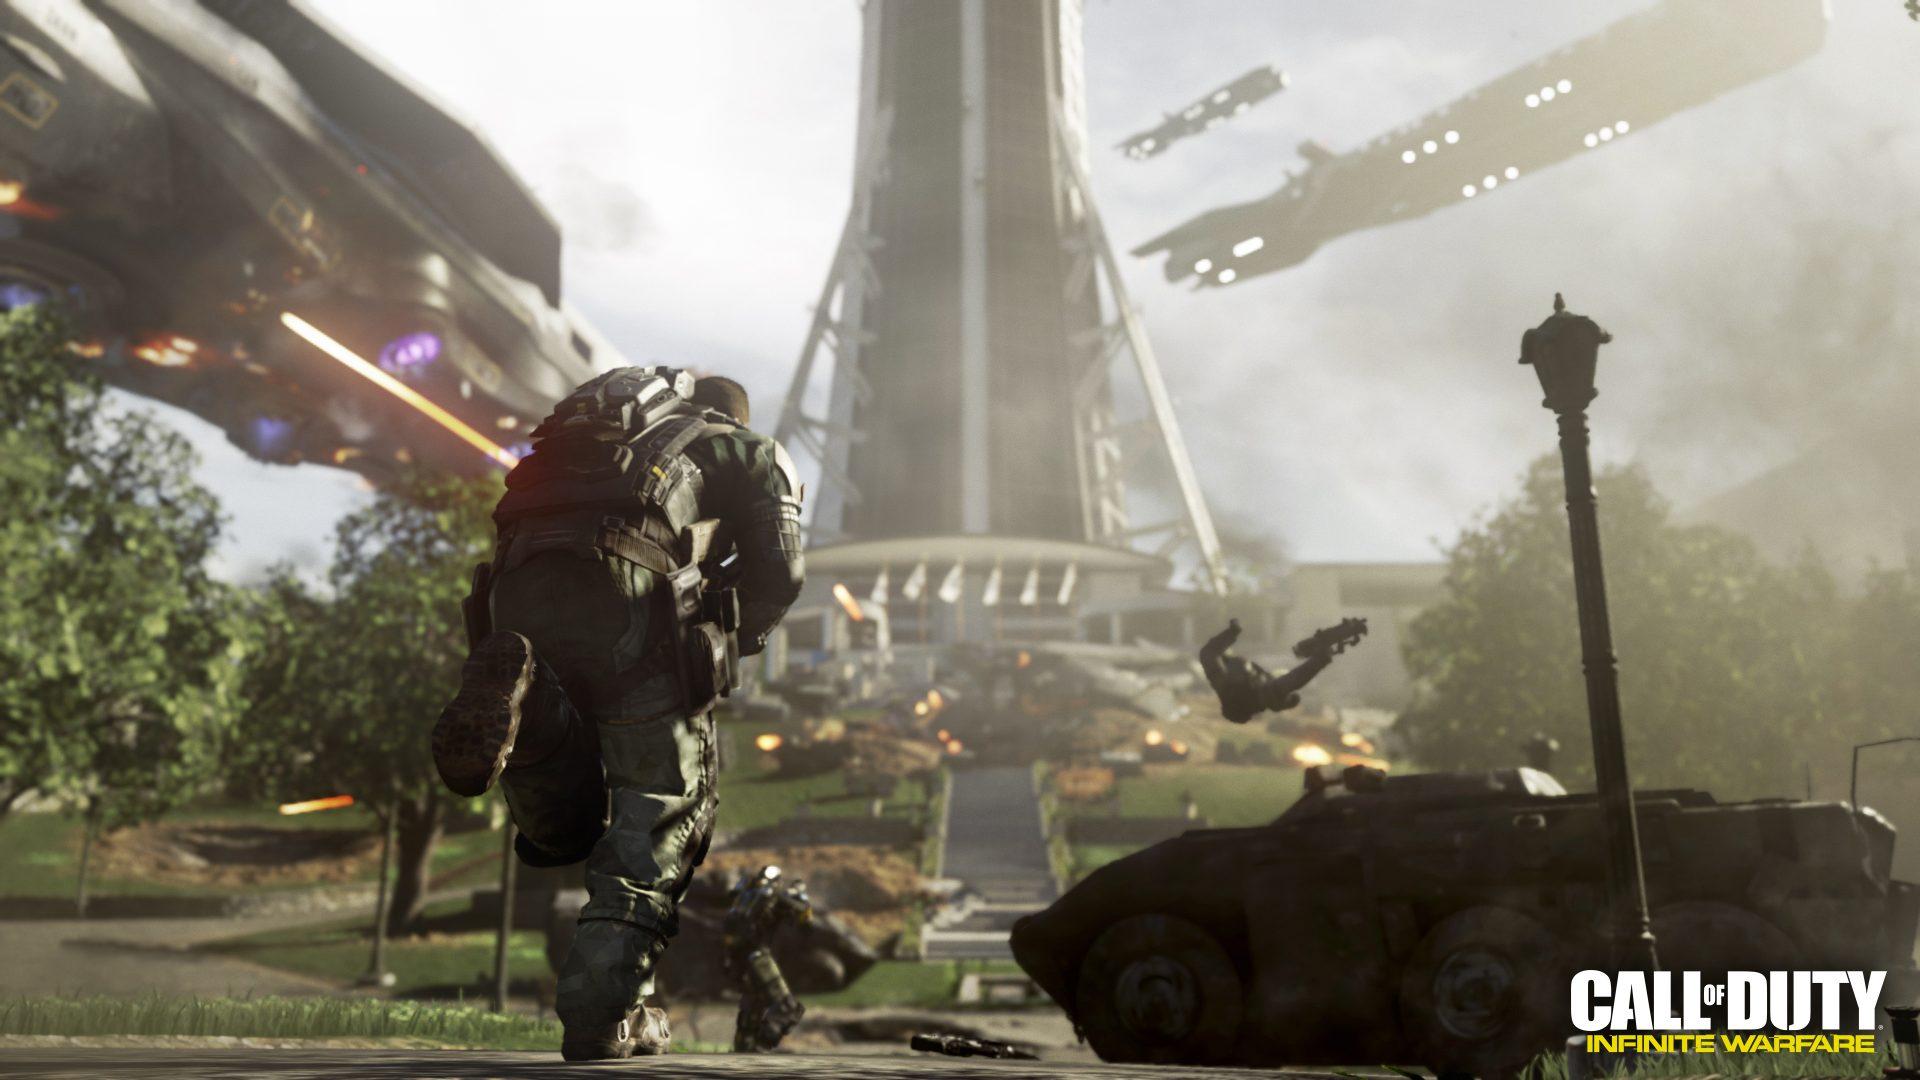 New Call Of Duty Infinite Warfare Multiplayer Trailer